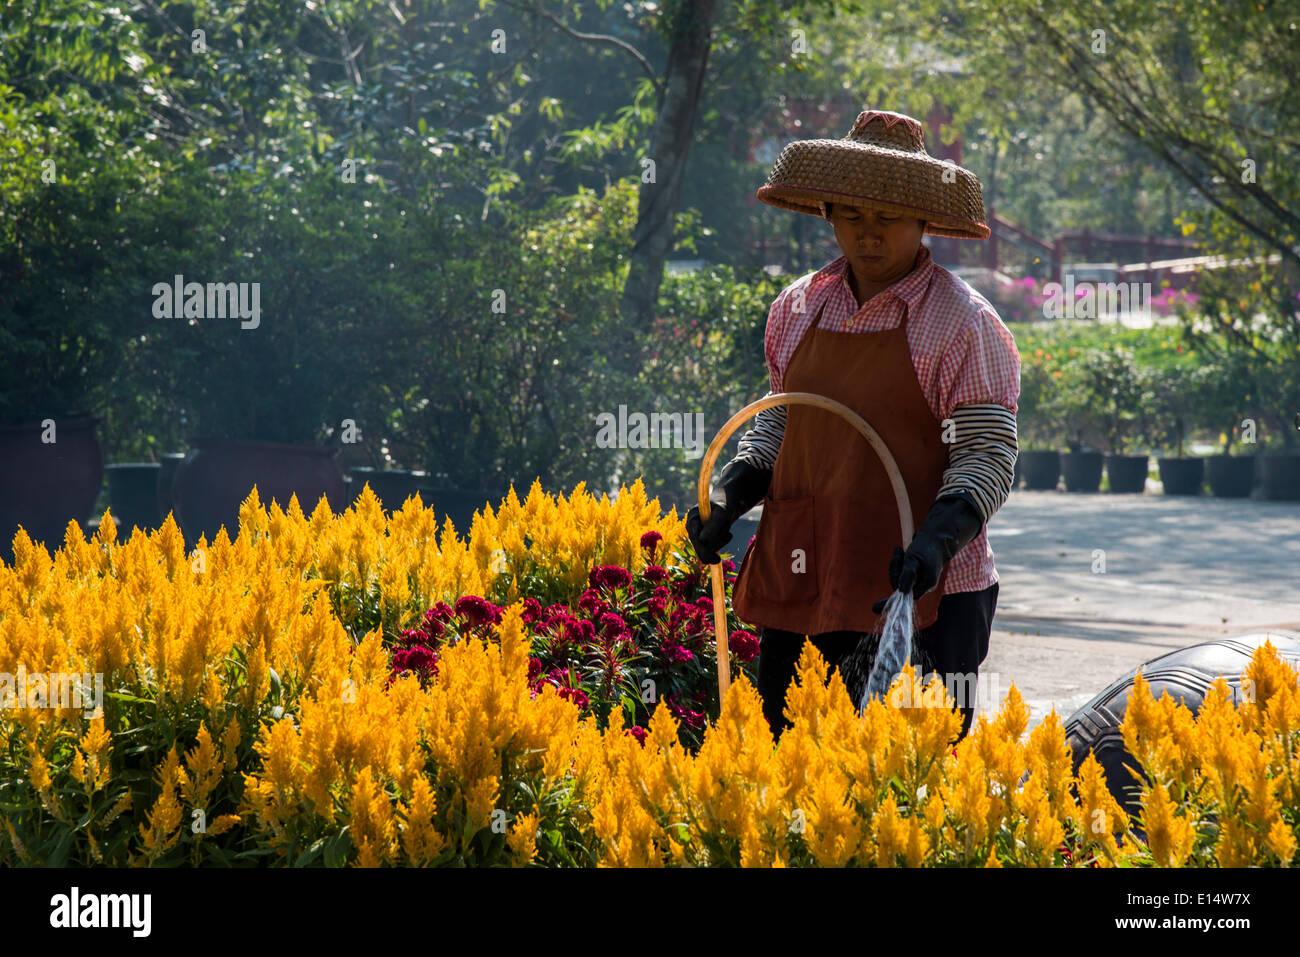 Woman wearing a straw hat, watering flowers, Po Lin Monastery, Lantau Island, Hong Kong, China - Stock Image